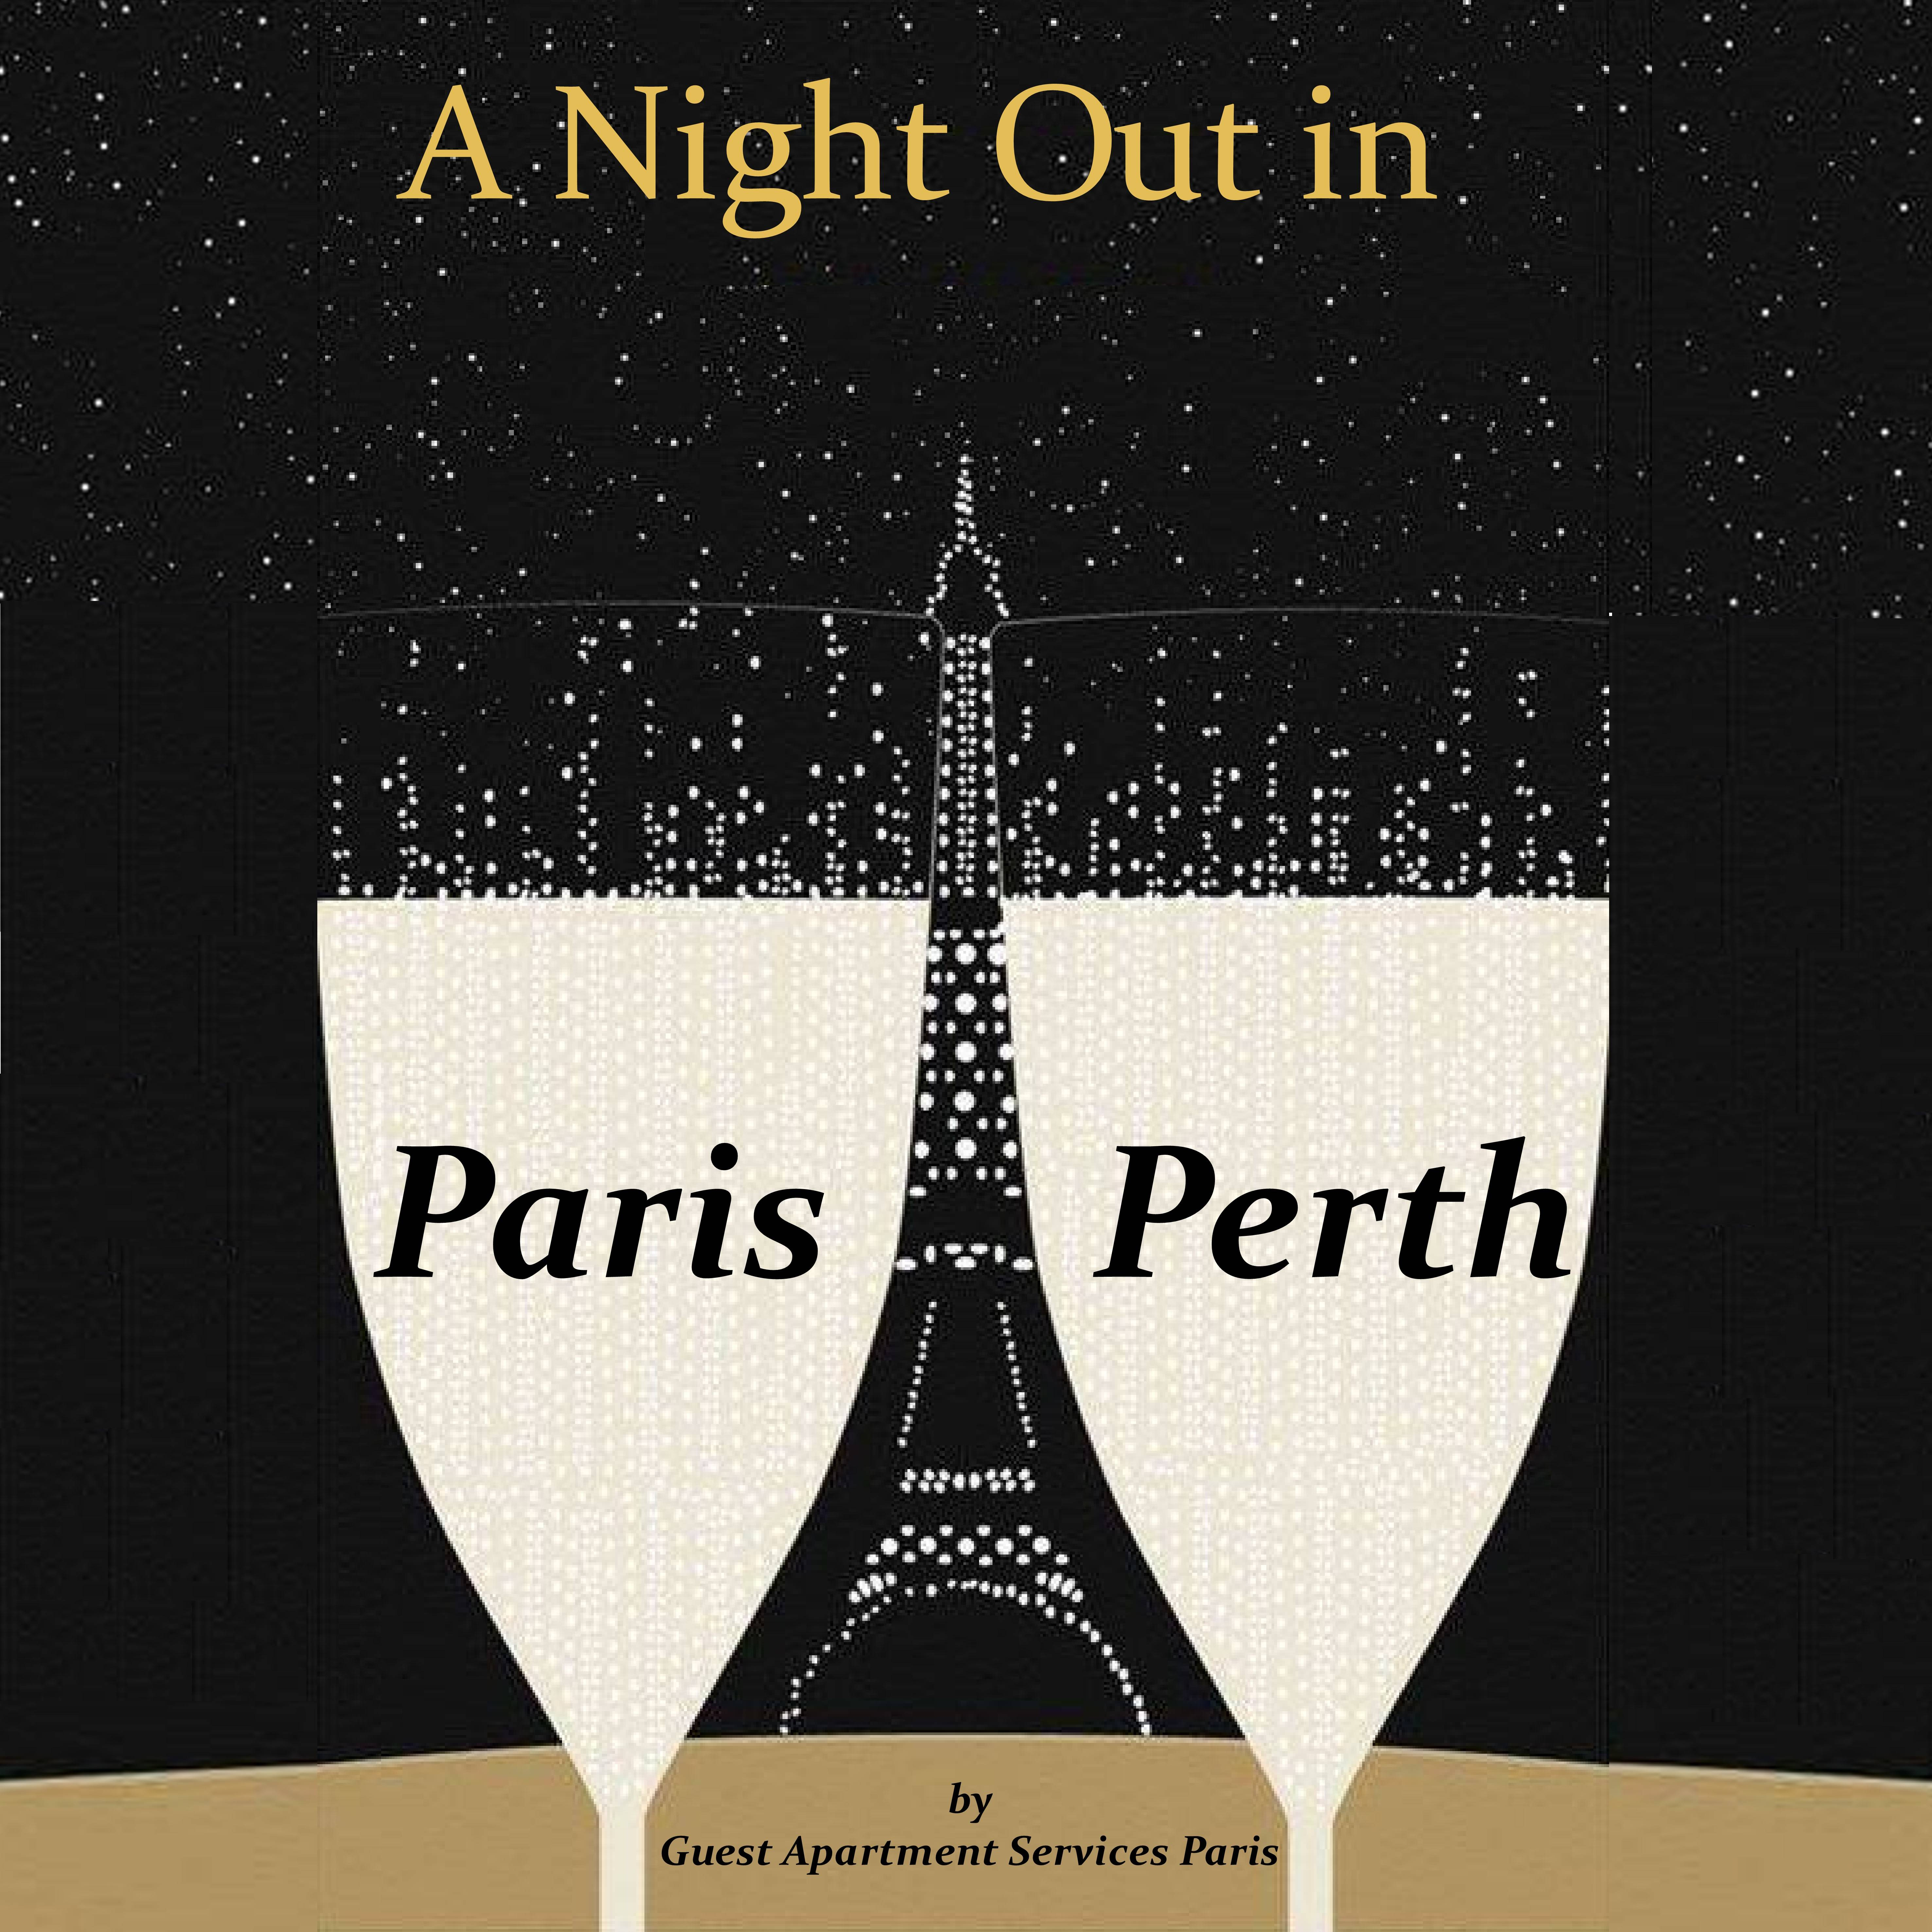 Cartion d'invitration Perth new Paris Perth